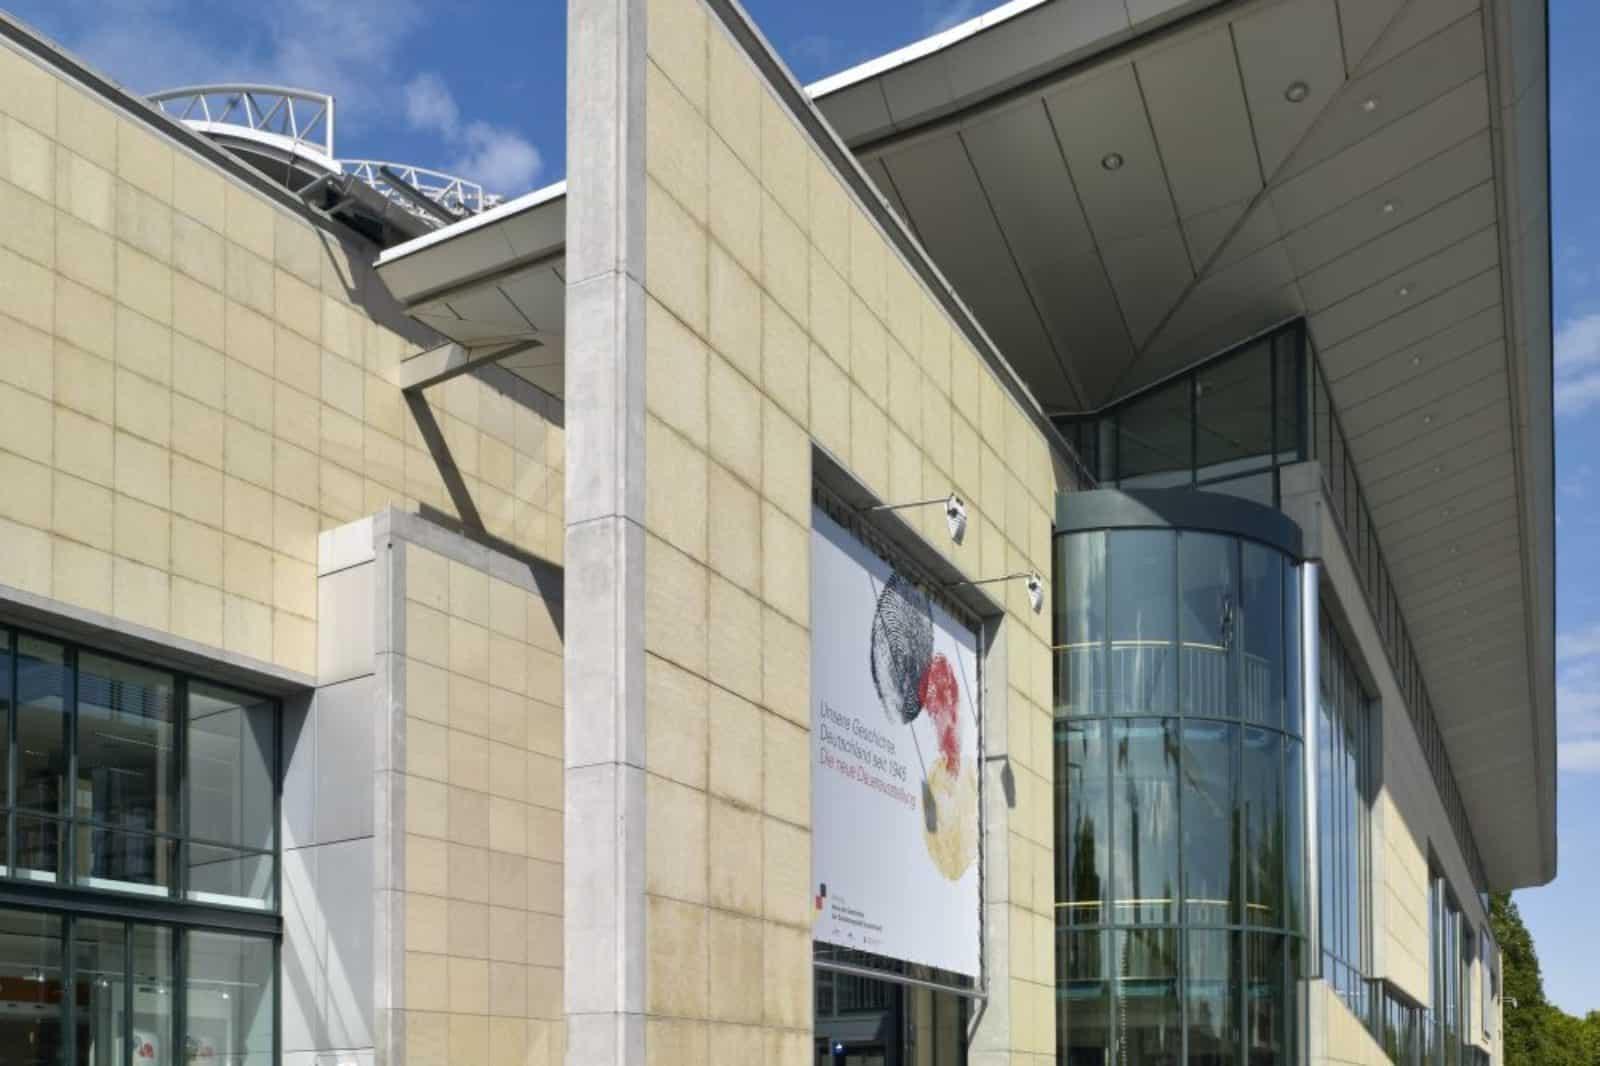 Haus der Geschichte Bonn - Haupteingang